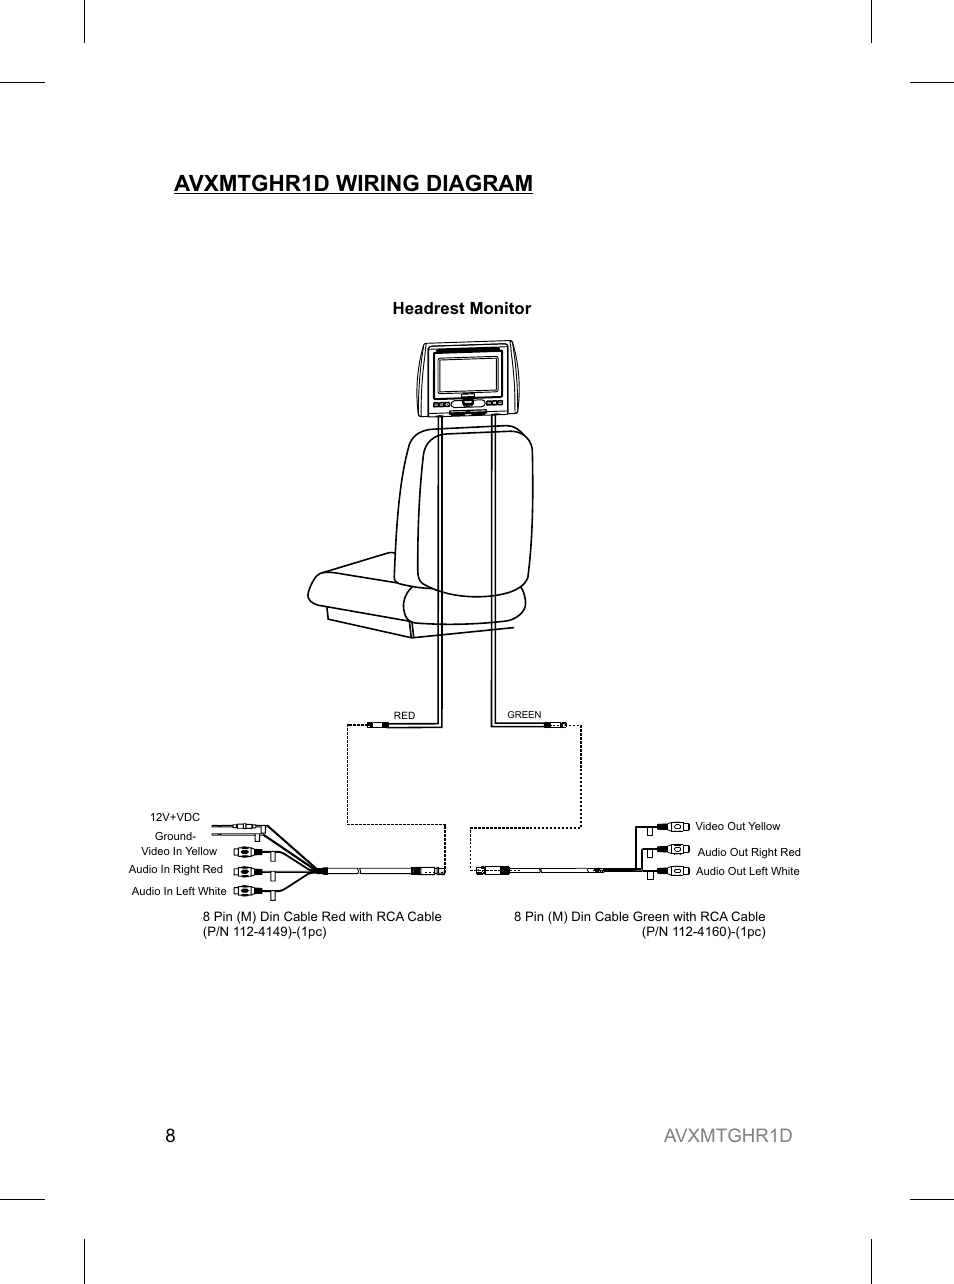 hight resolution of avxmtghr1d wiring diagram avxmtghr1d 8 audiovox avxmtghr1d user manual page 8 28